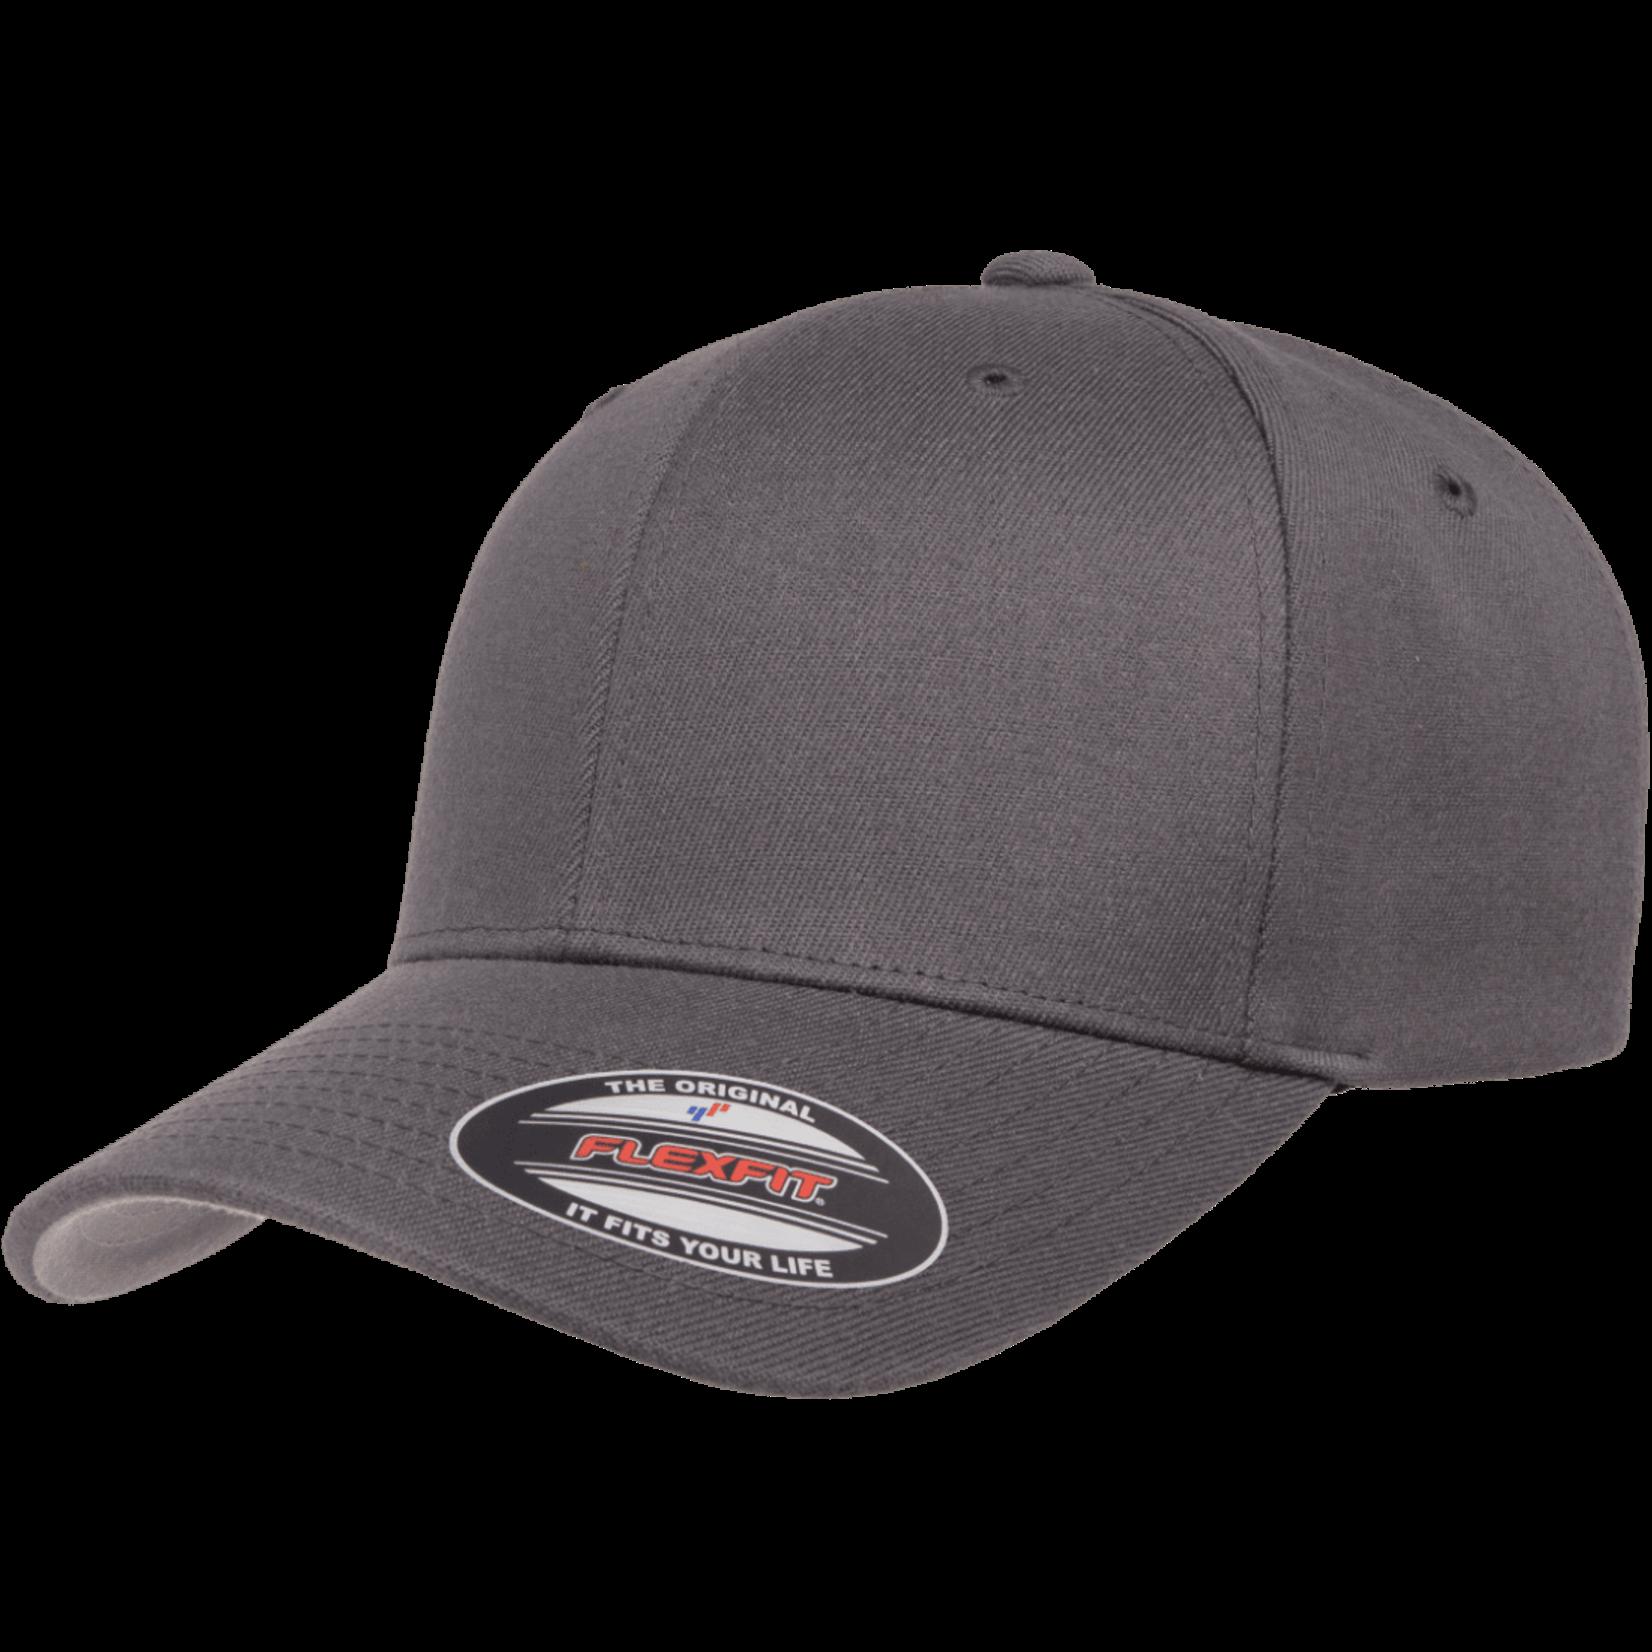 Flexfit Flexfit 6477 Wool Blend Ballcap - Grey